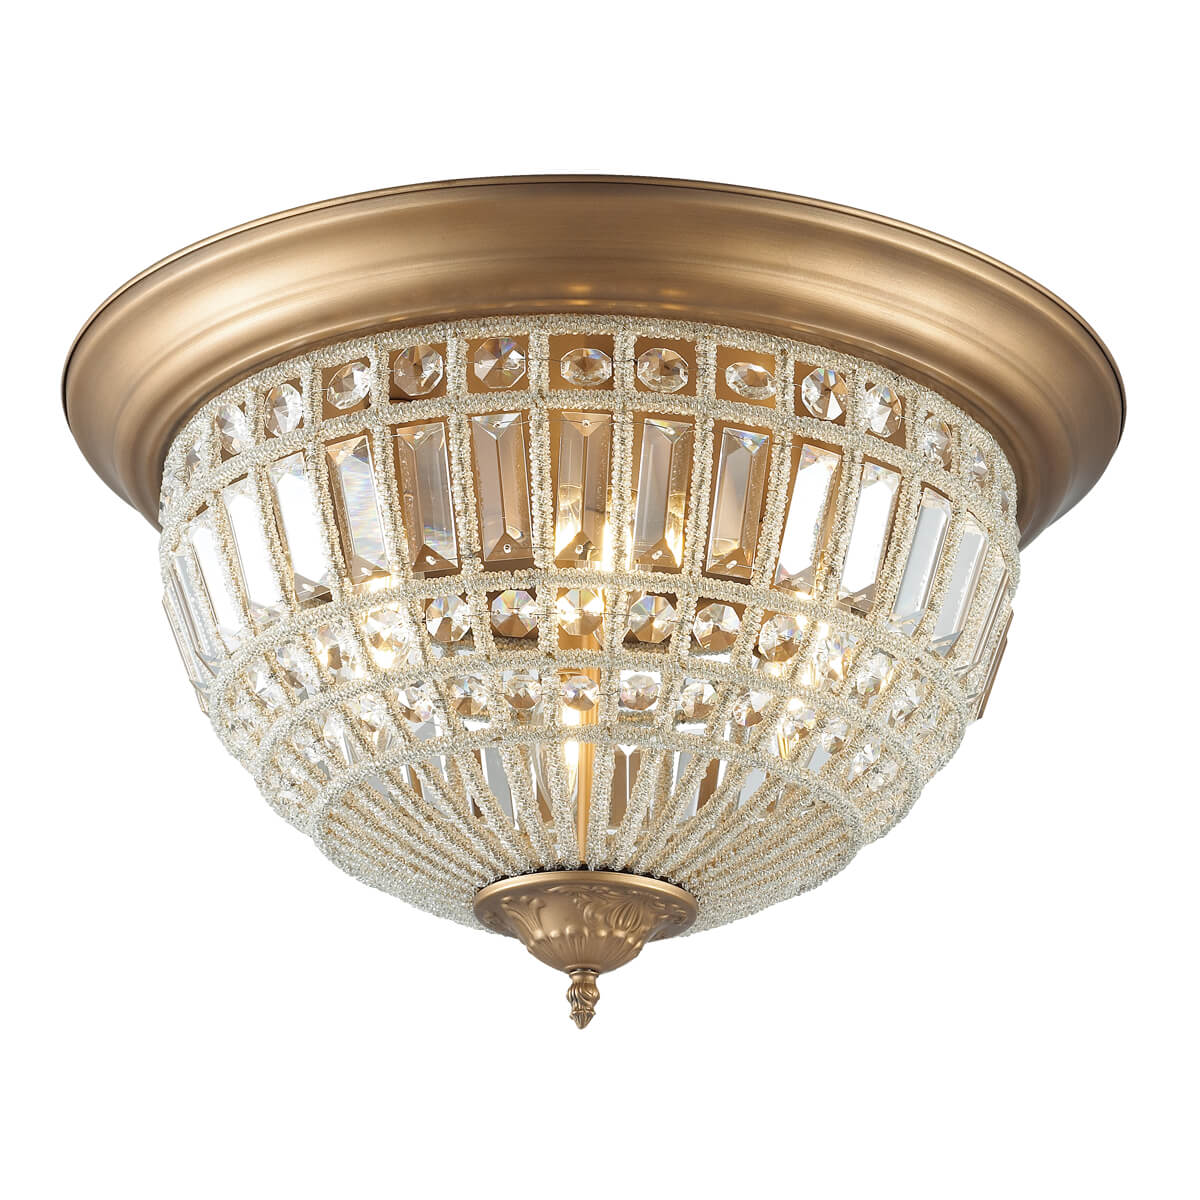 Светильник Favourite 2296-6C Orientalium потолочный светильник favourite skyfall 1671 6c